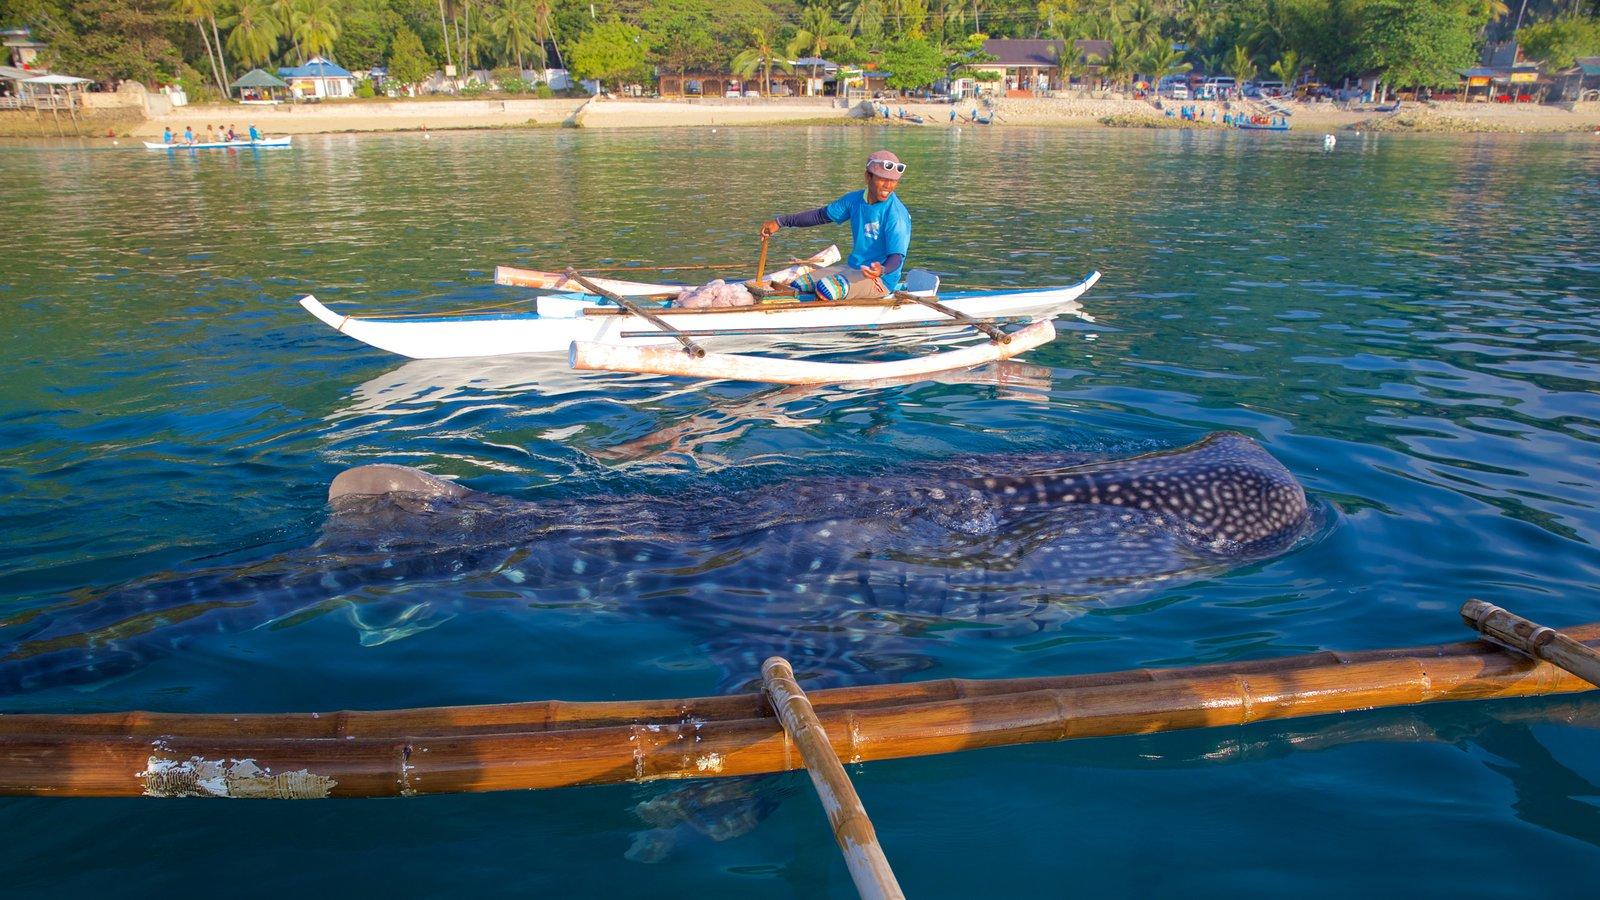 cebu island cebu source philippines department of tourism valentino ...